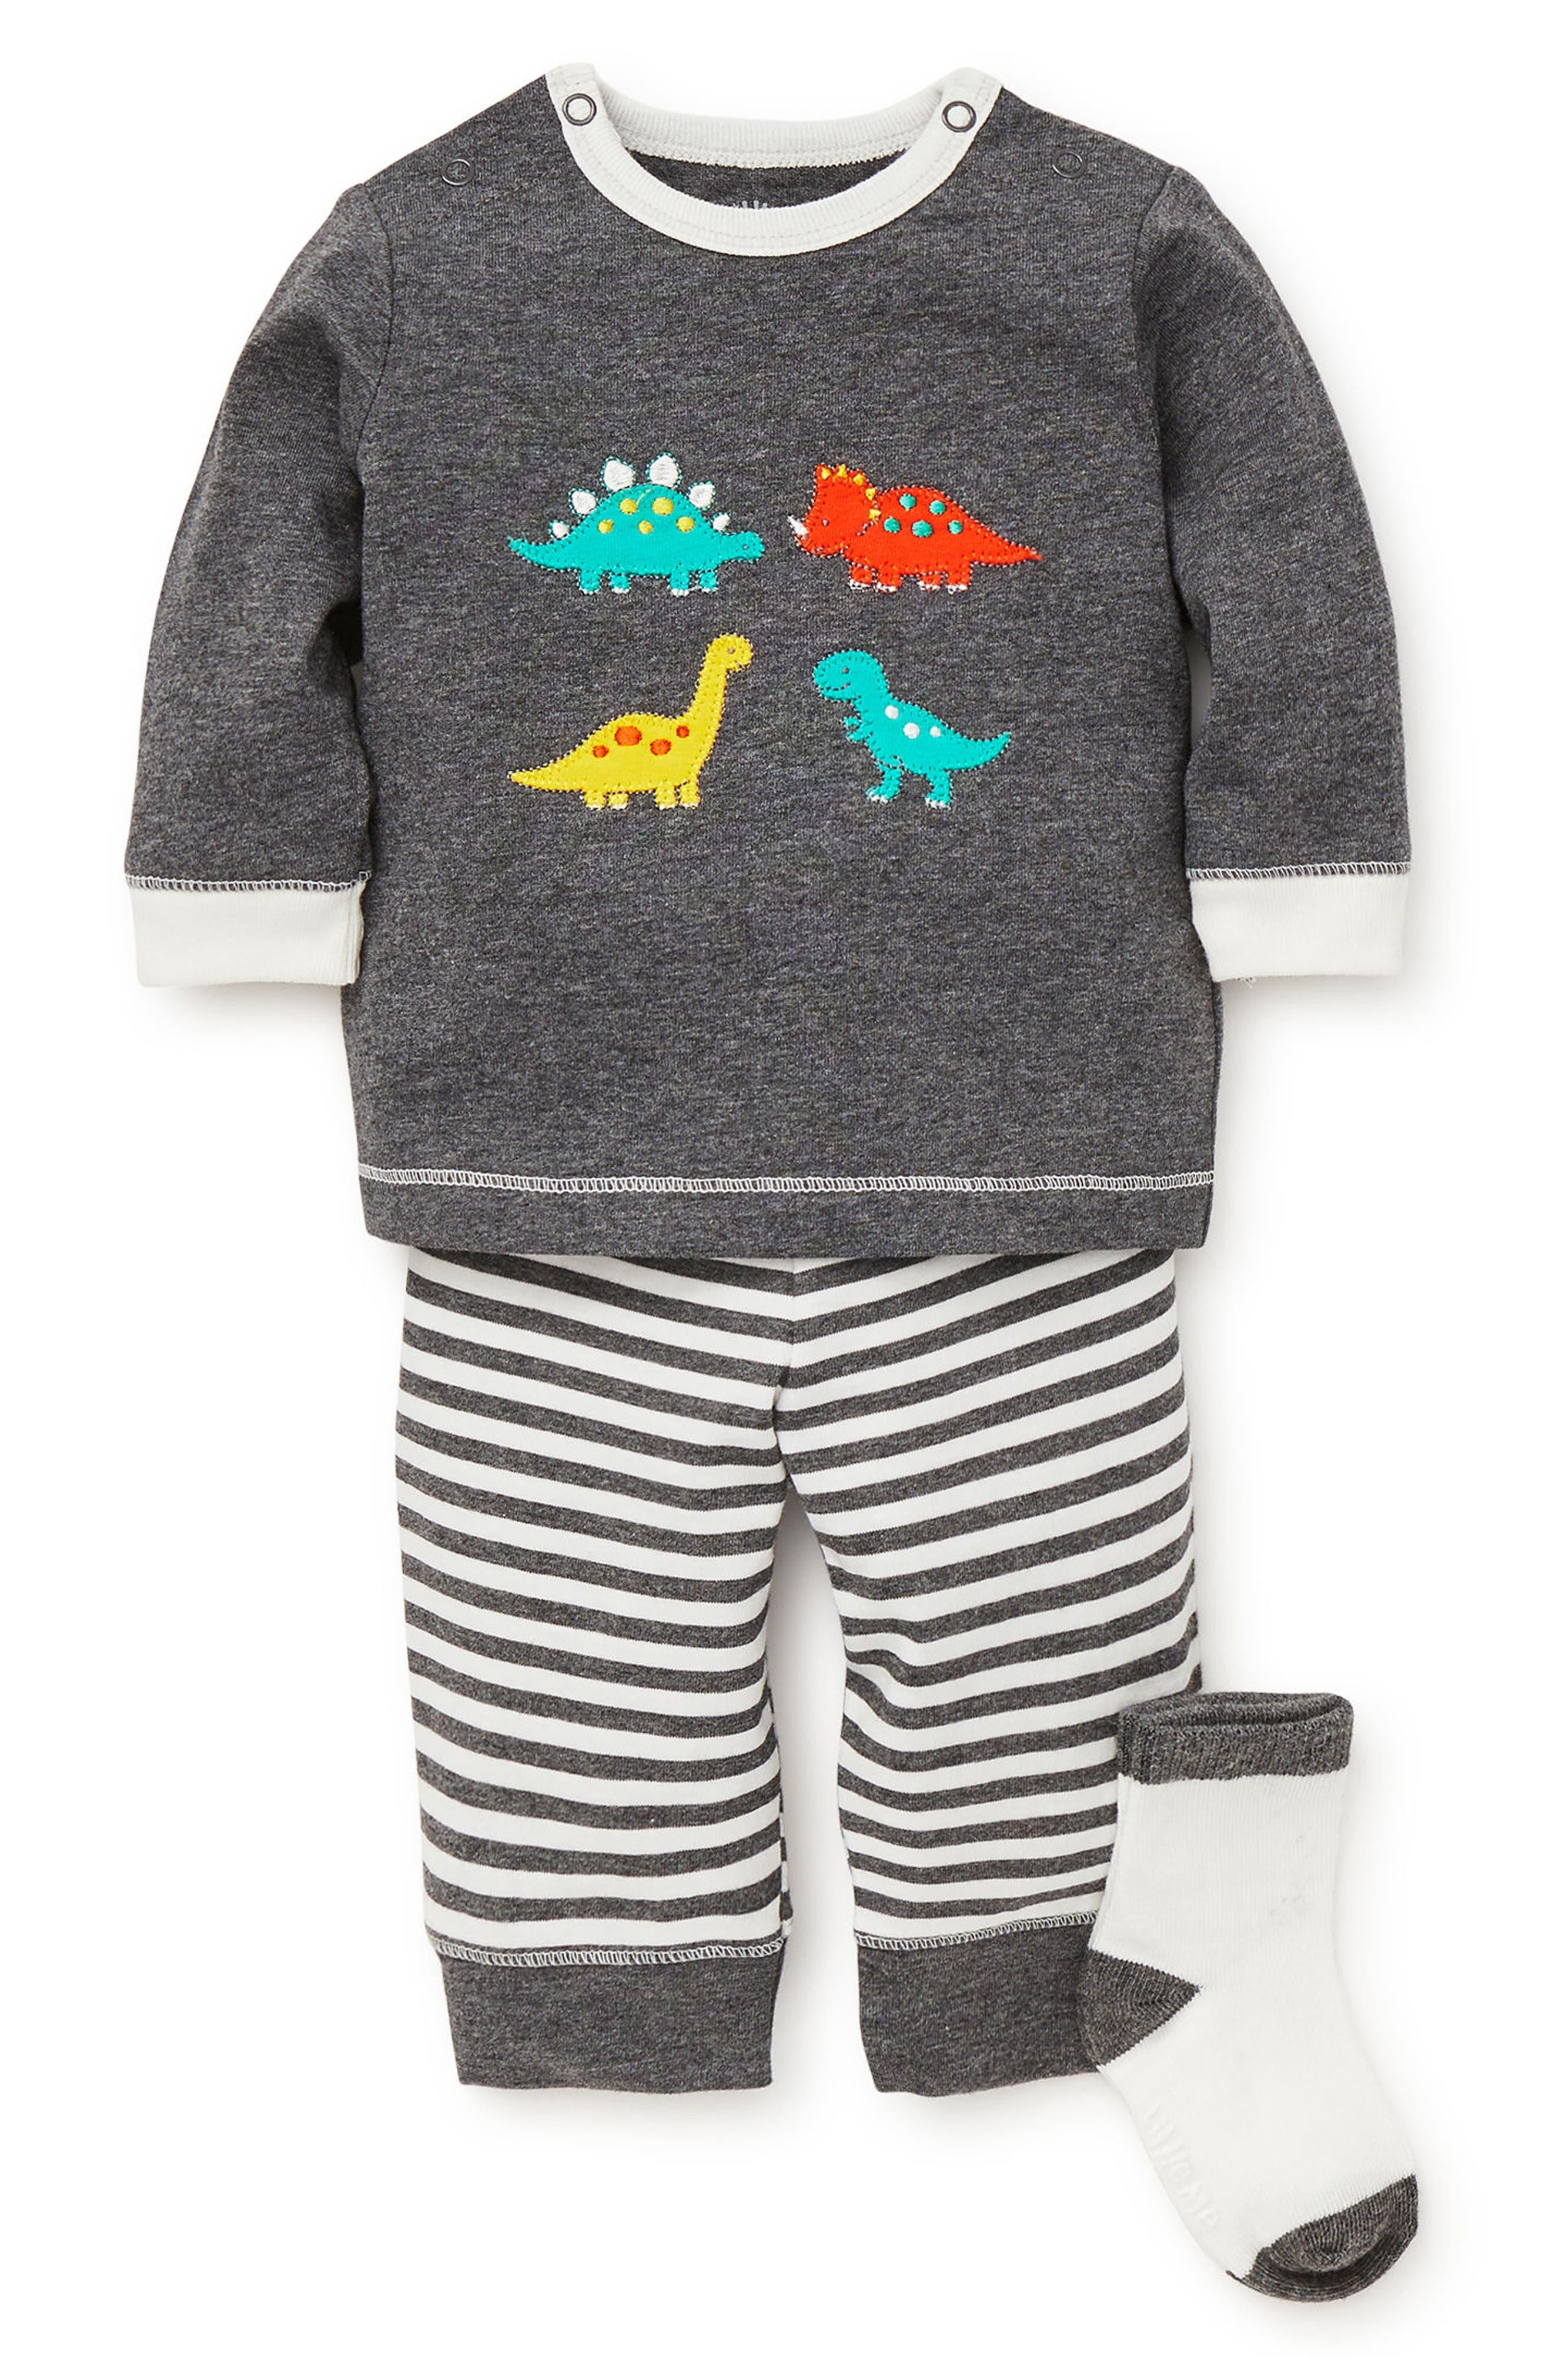 Fun Dinos Sweatshirt, Jogger Pants & Socks Set,                             Main thumbnail 1, color,                             GREY HEATHER MULTI